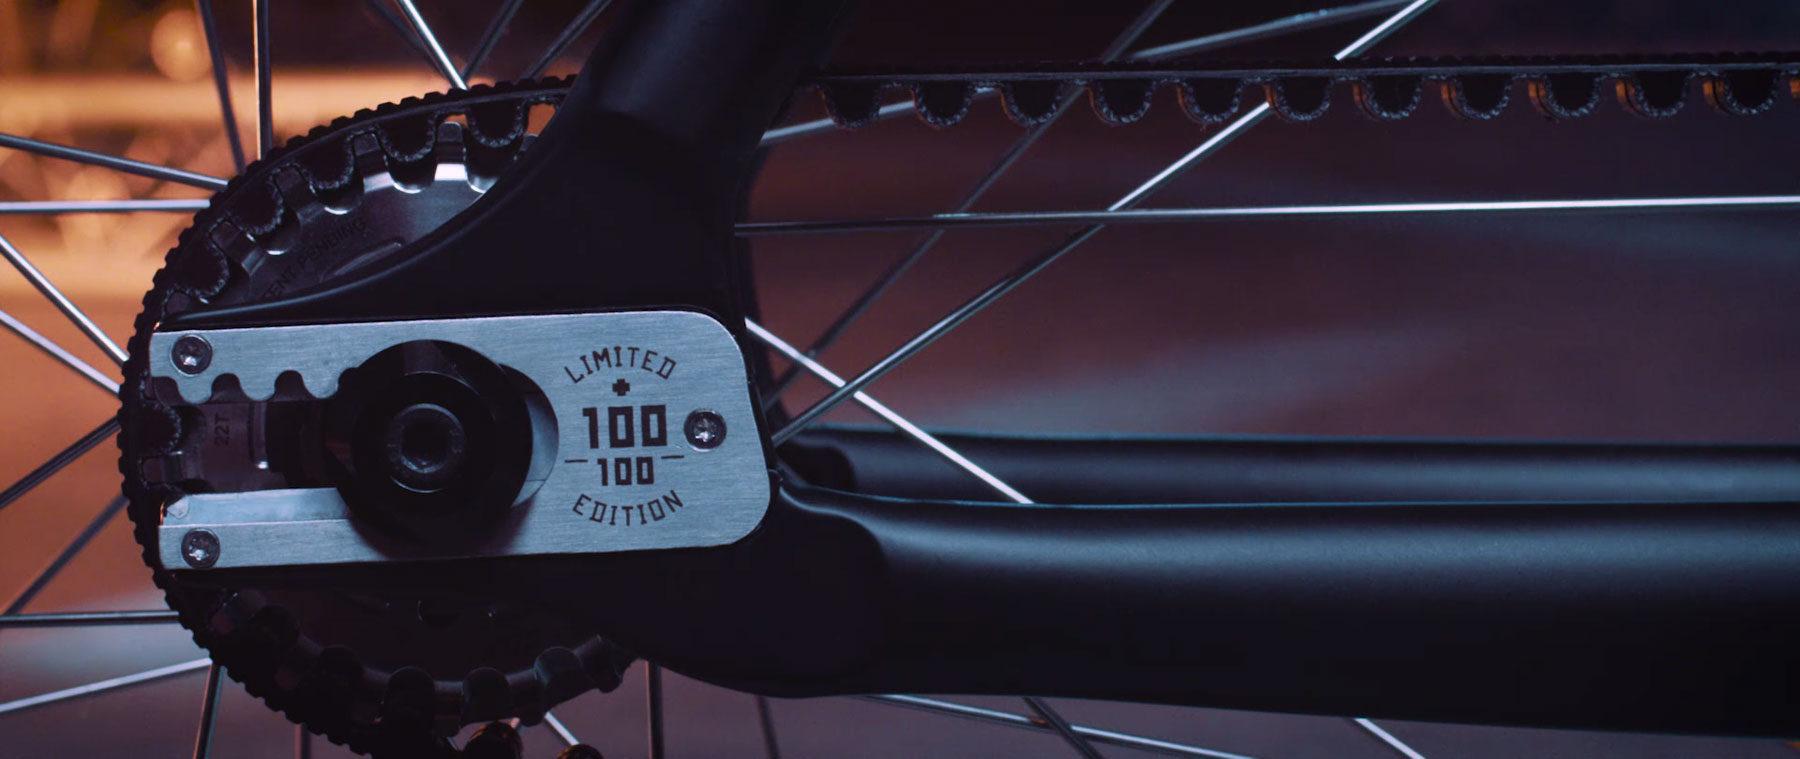 ADOT Rammstein Bike